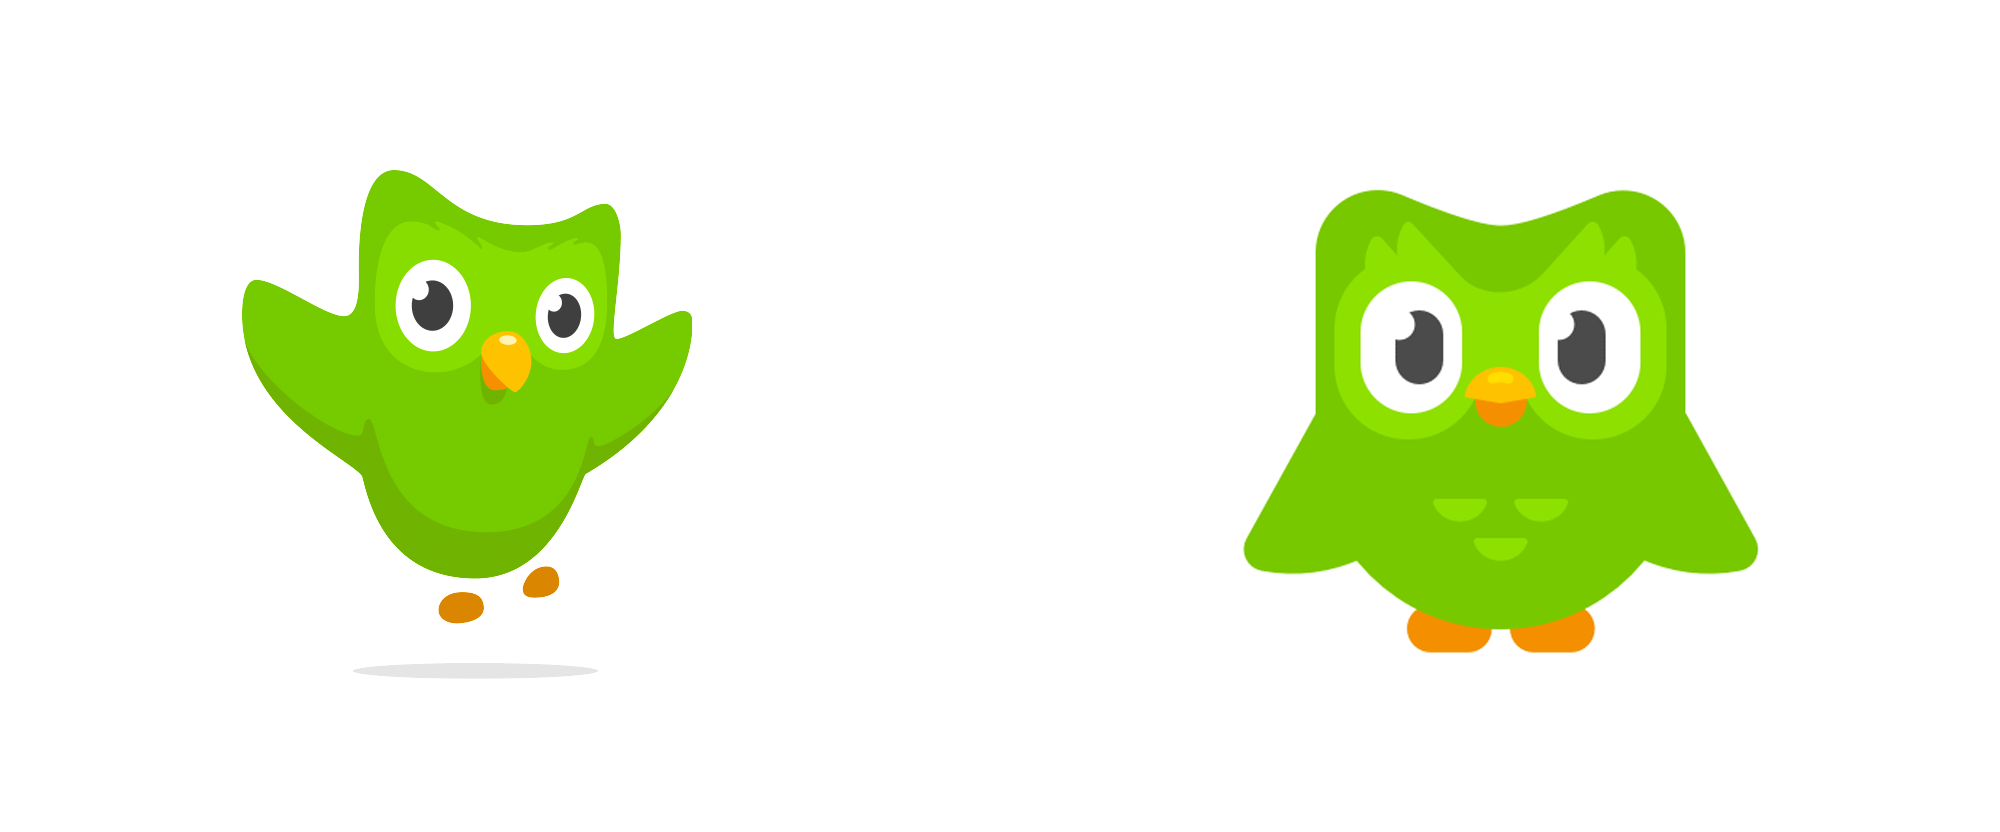 Brand New: New Logo for Duolingo done In.